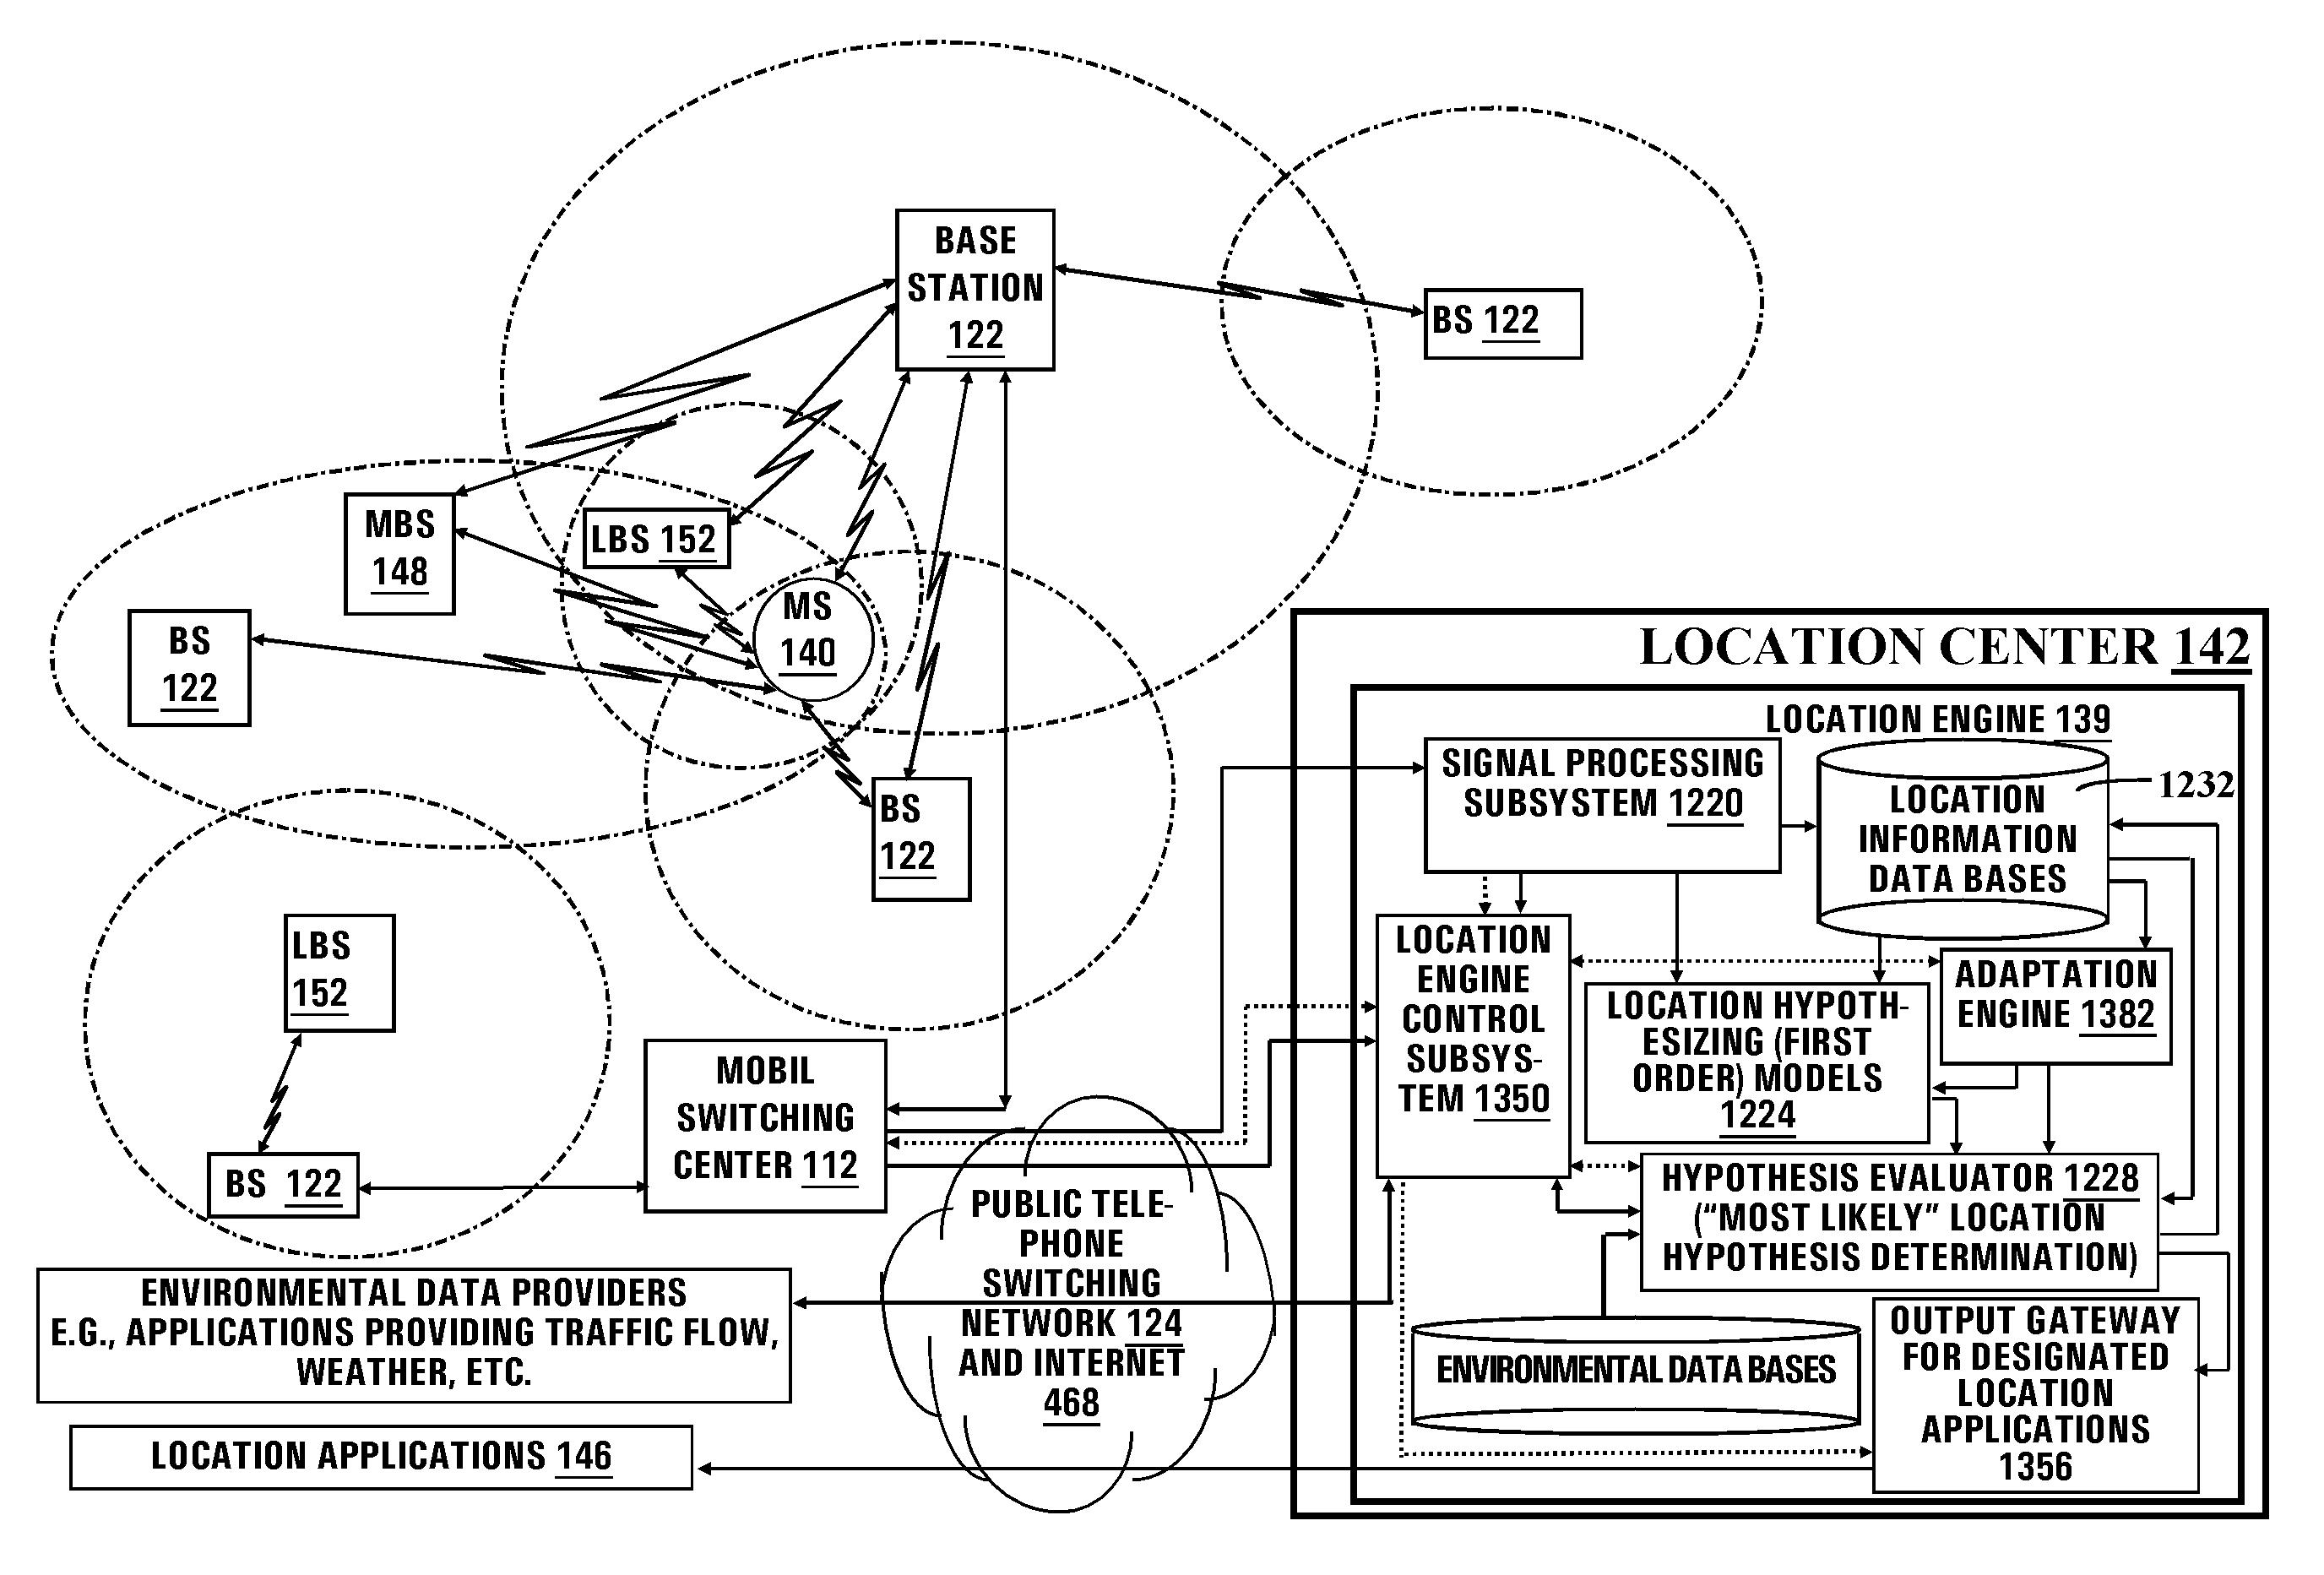 Patent US 9,134,398 B2